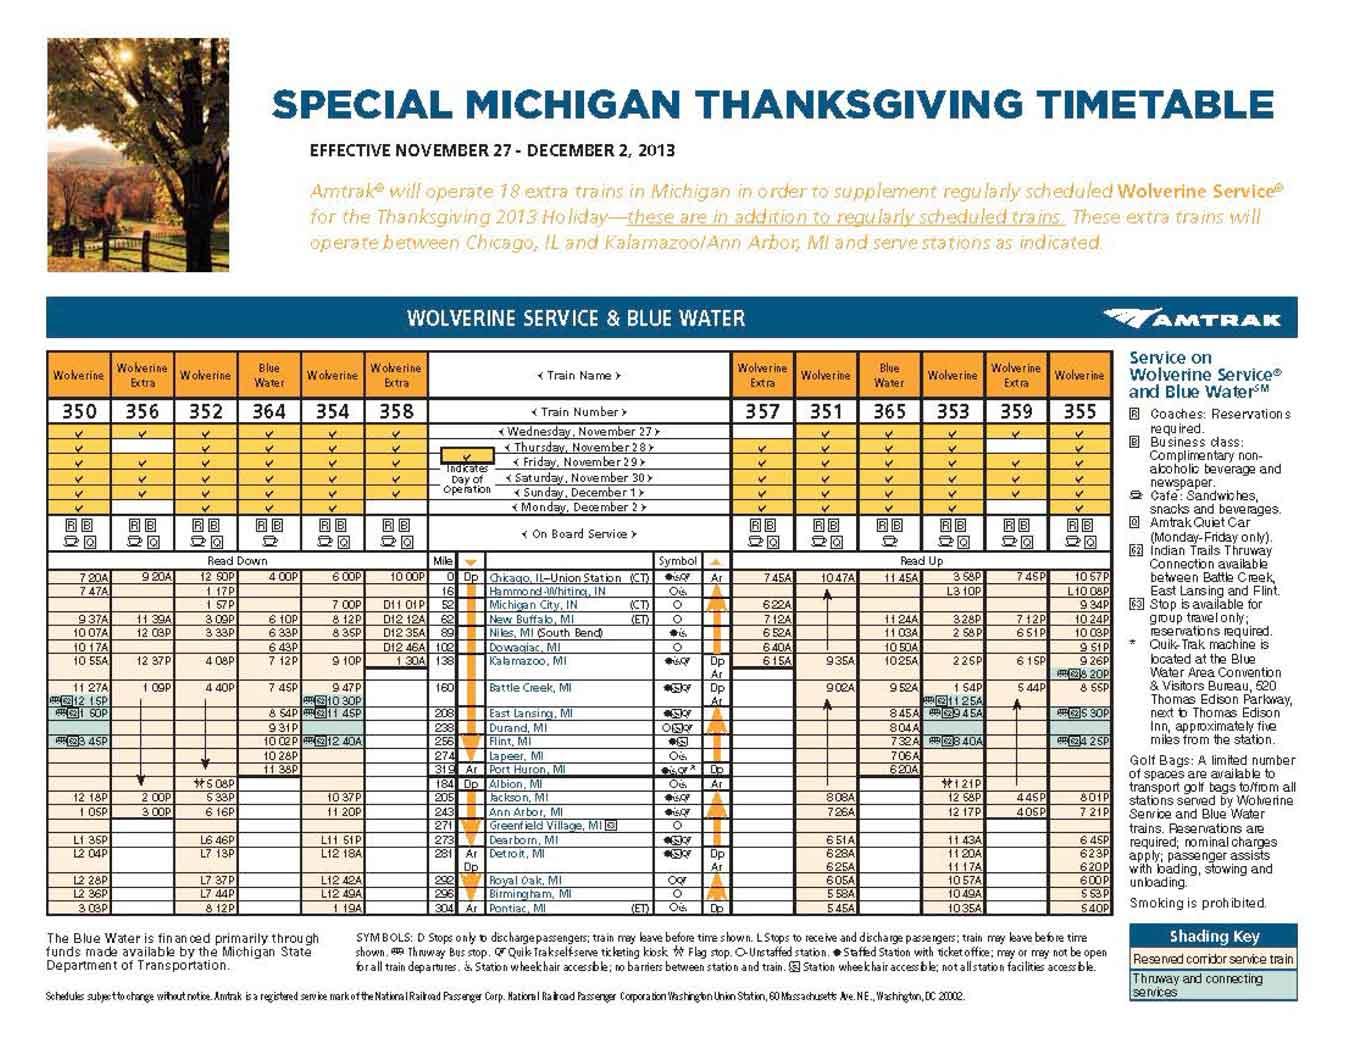 Amtrak-Chicago-Michigan-Thanksgiving-ATK-13-134-2